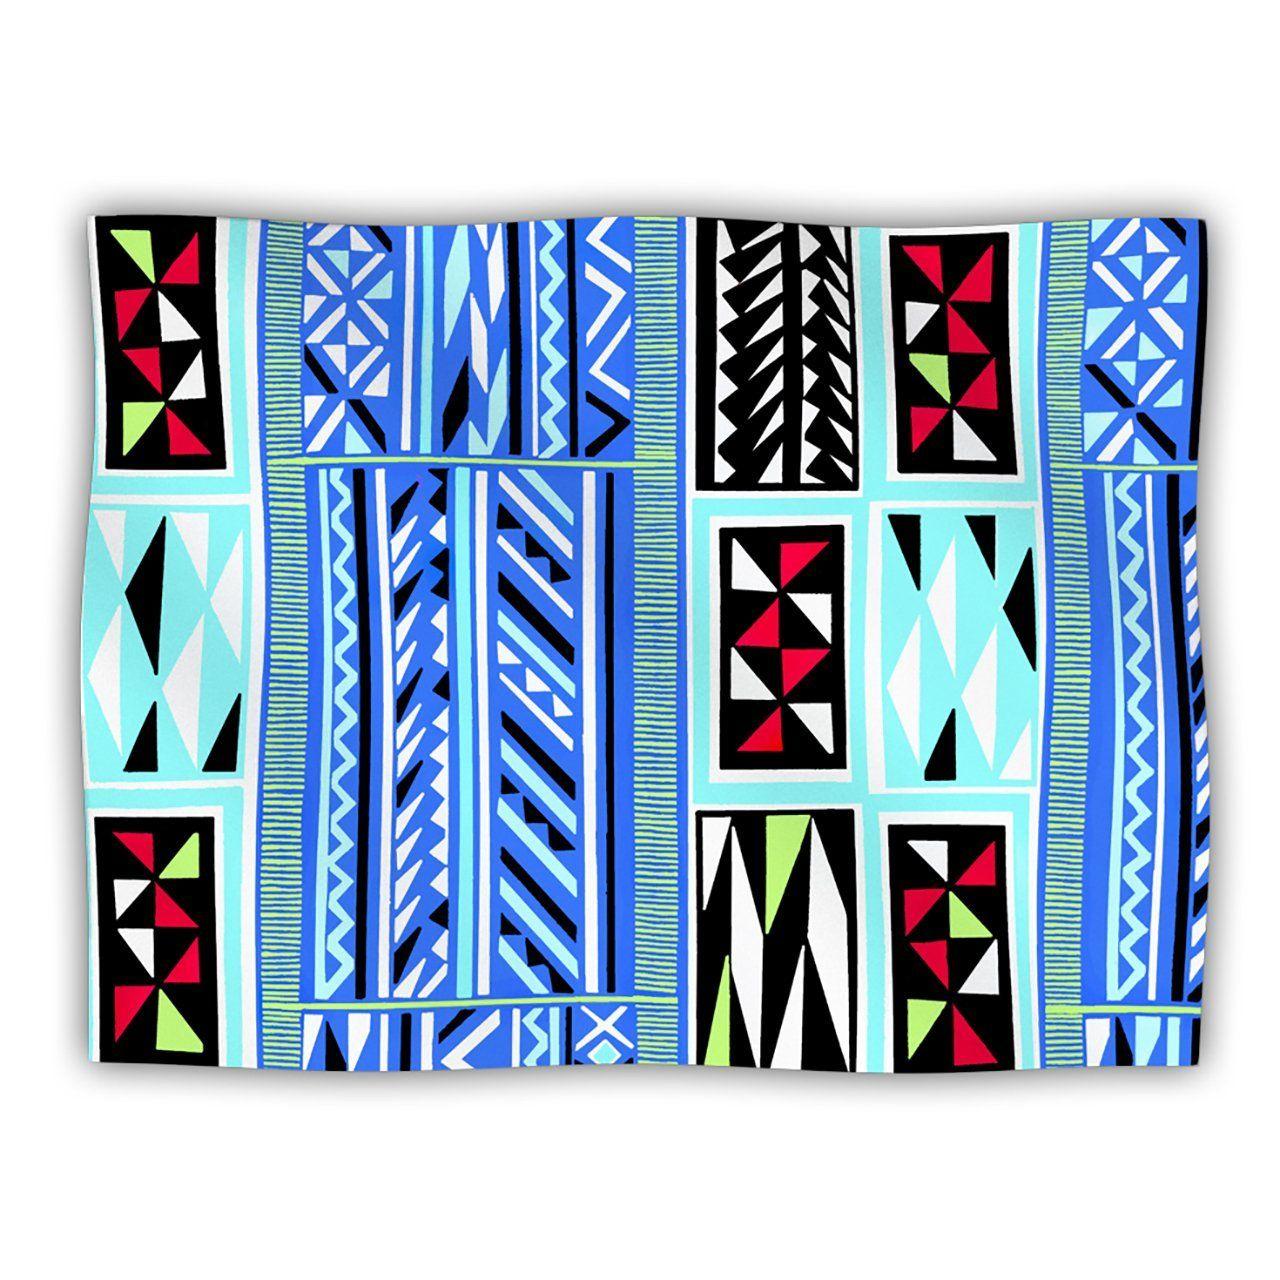 Kess InHouse Vikki Salmela 'American Blanket Pattern' Pet Blanket, 60 by 50-Inch   : Cats items